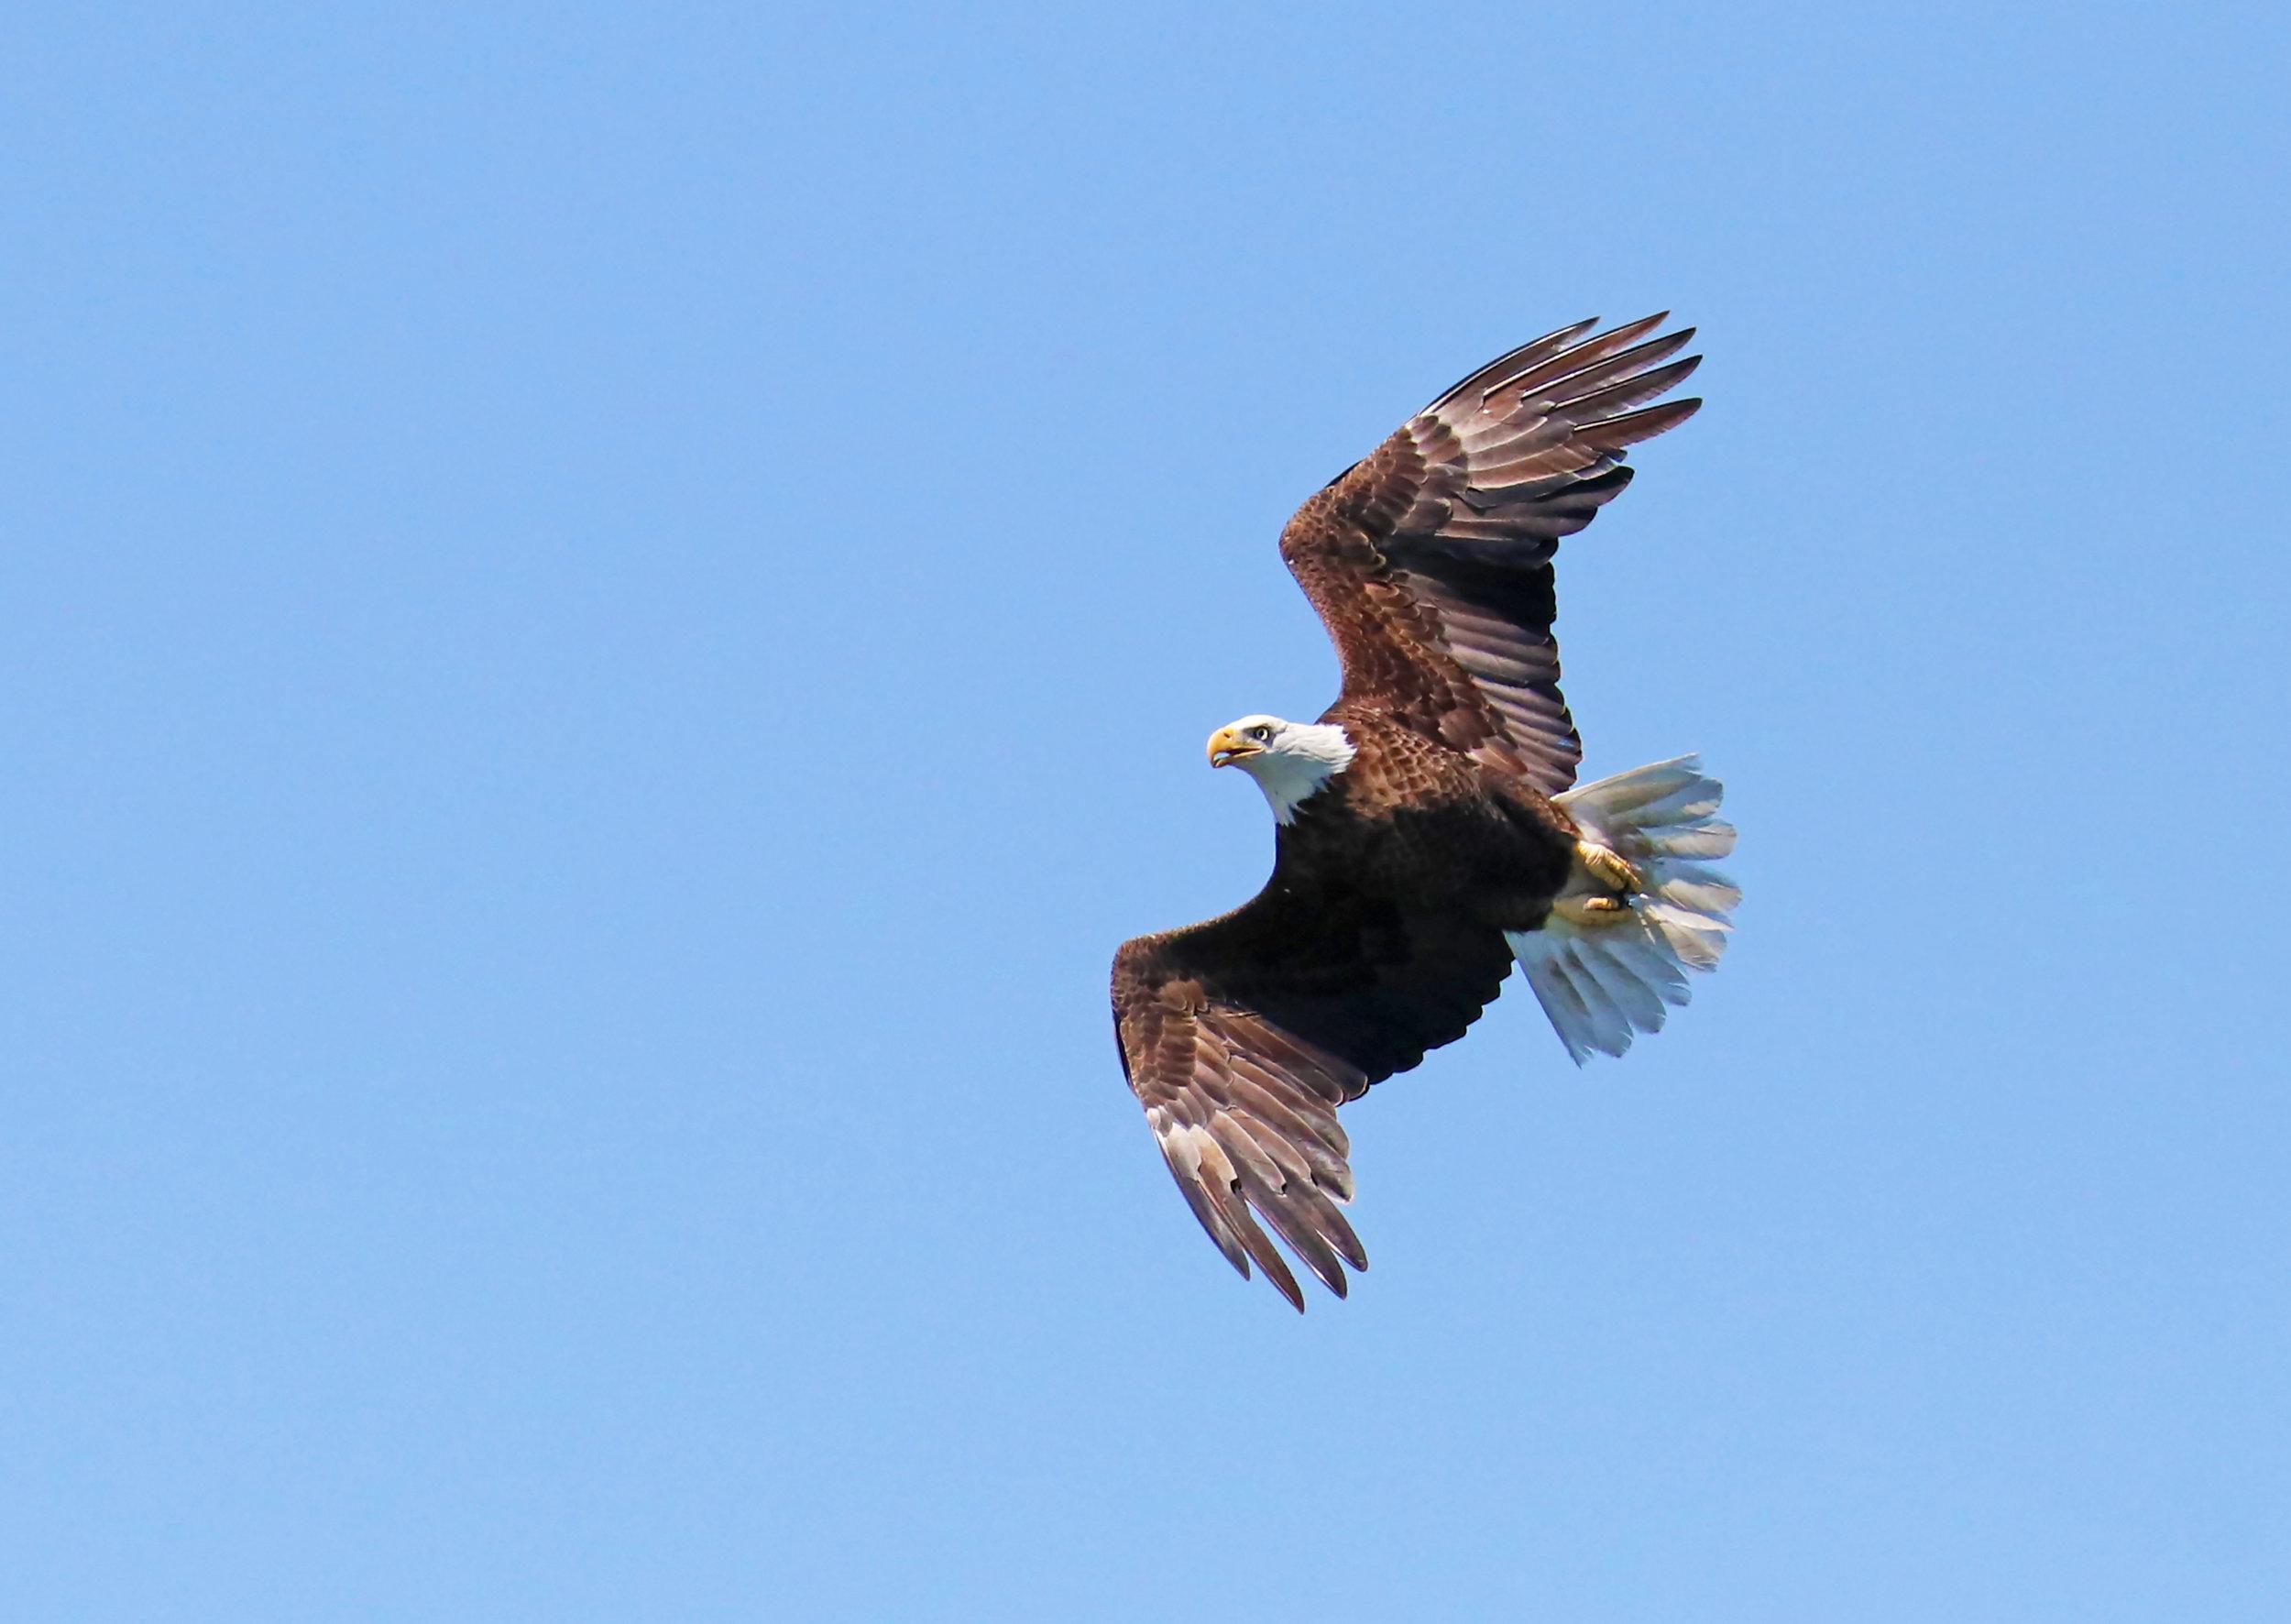 Flight of an eagle